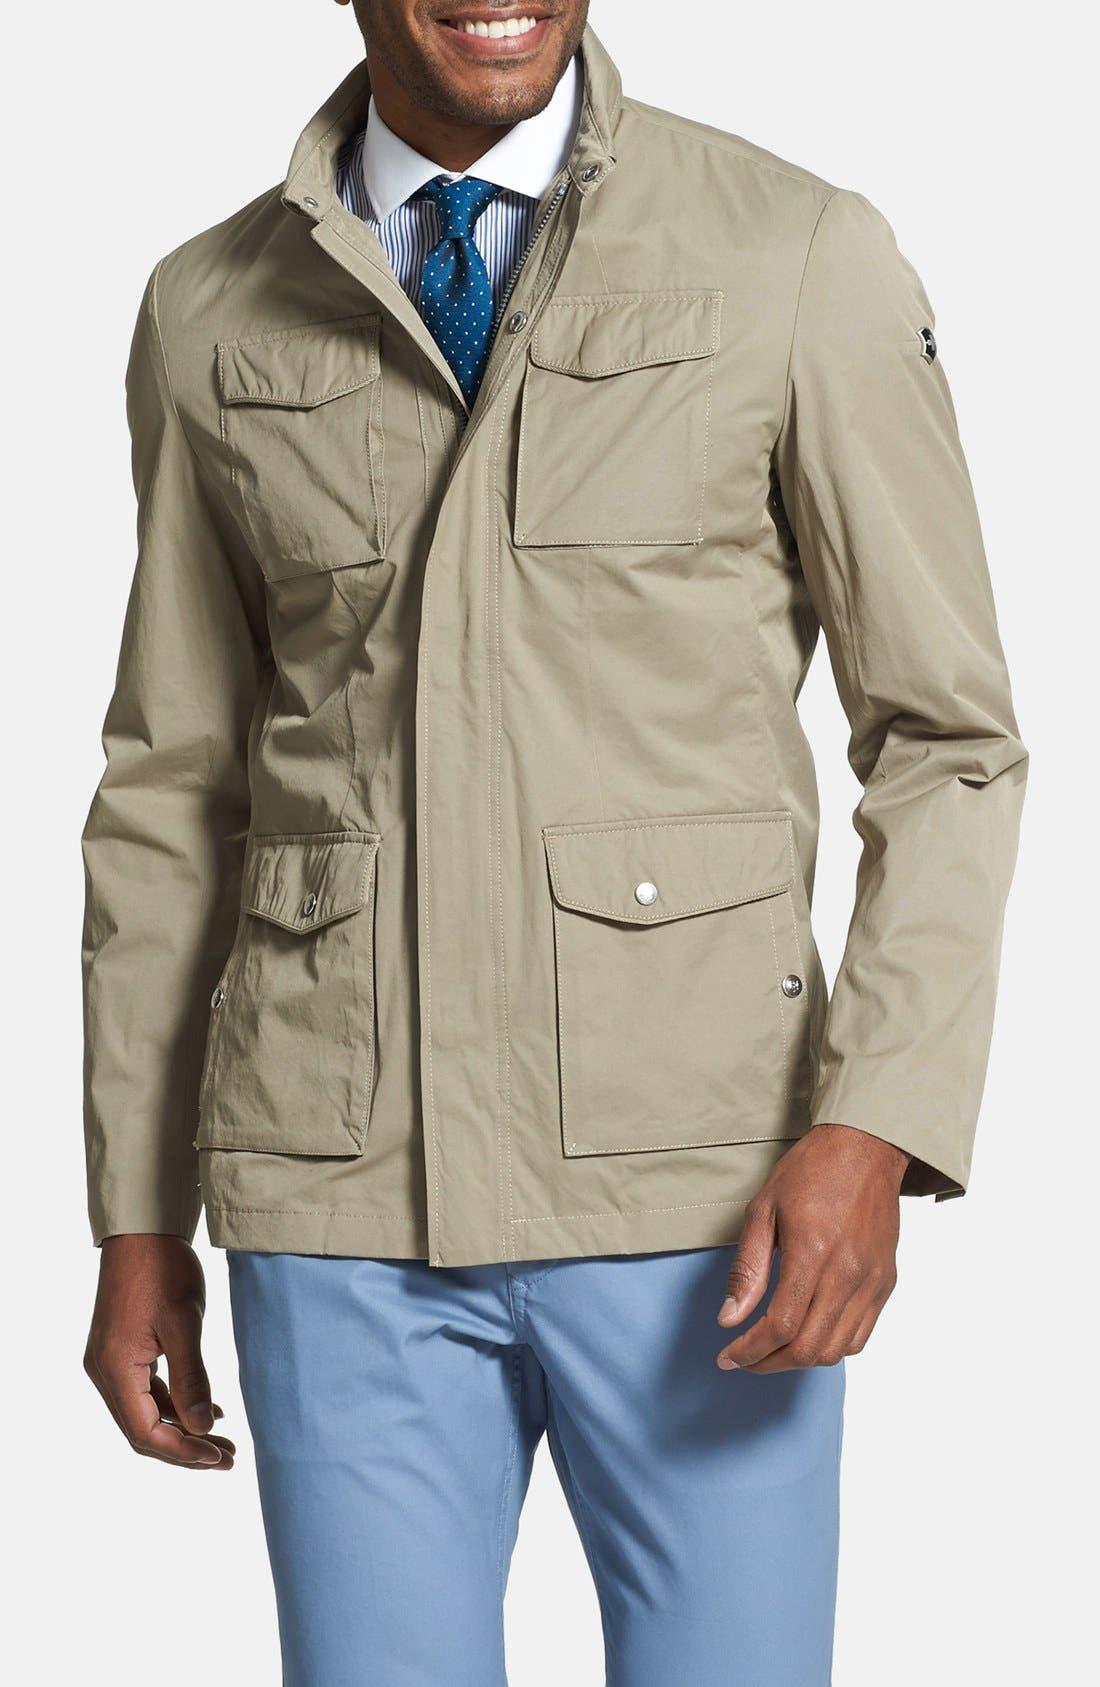 Alternate Image 1 Selected - Victorinox Swiss Army® 'Panama' Water Repellent Jacket